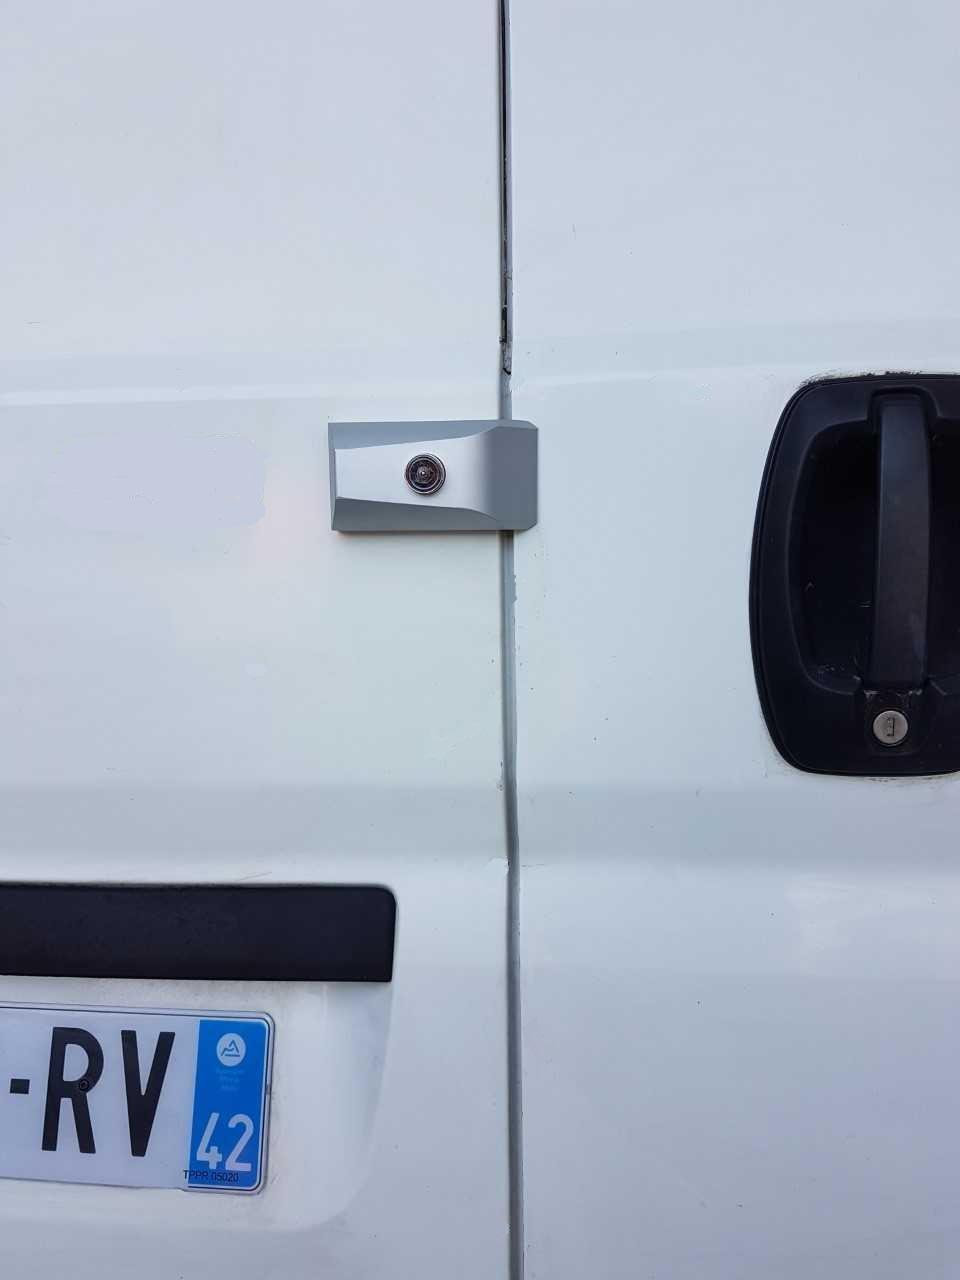 Serrure antivol pour vehicules utilitaires imc 2333 2321 verrou fuyant